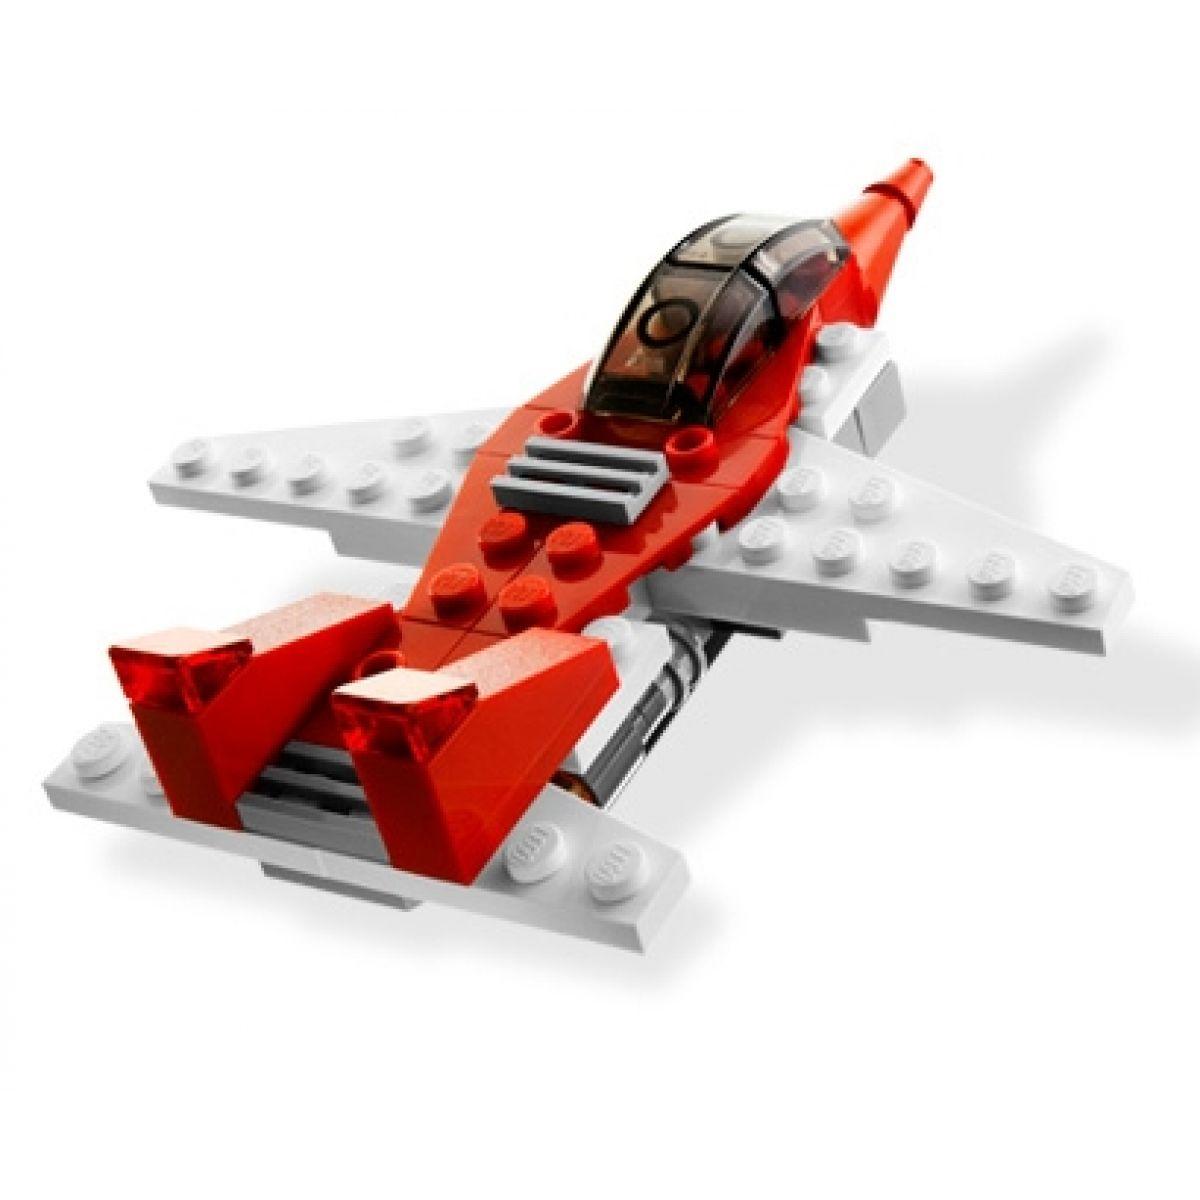 LEGO 6741 Mini tryskáč